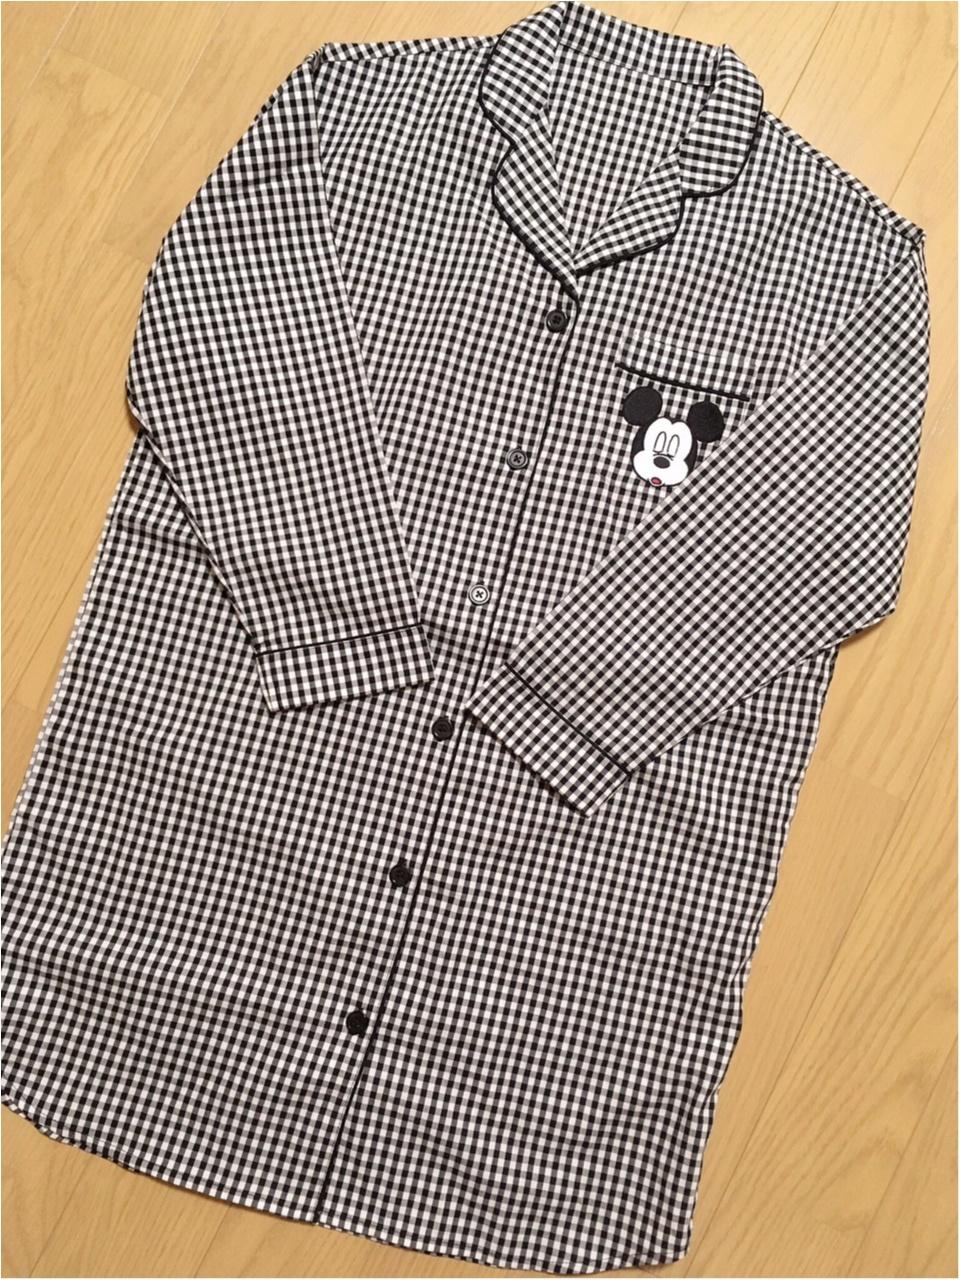 【GU】話題のDisneyコラボパジャマから新作が登場!ワンピースタイプのパジャマも♡_2